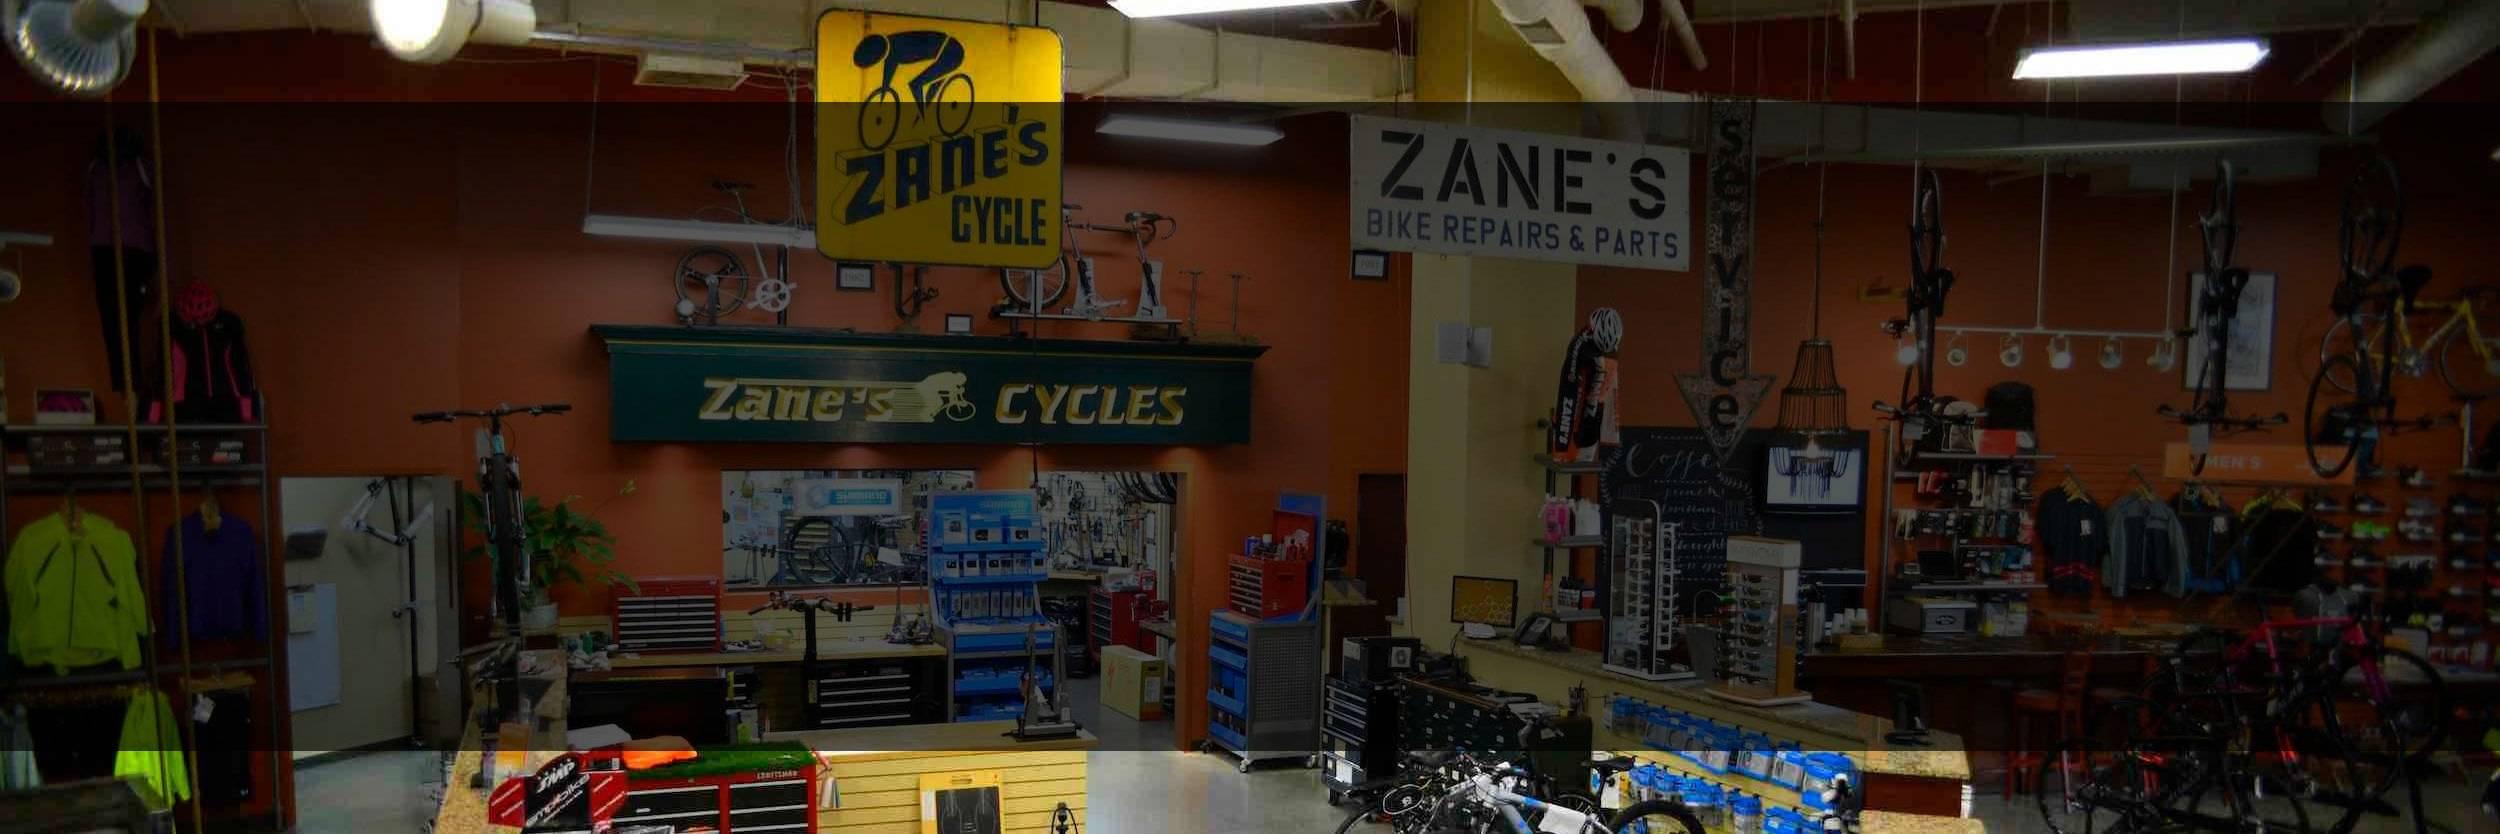 Zane's Service Center